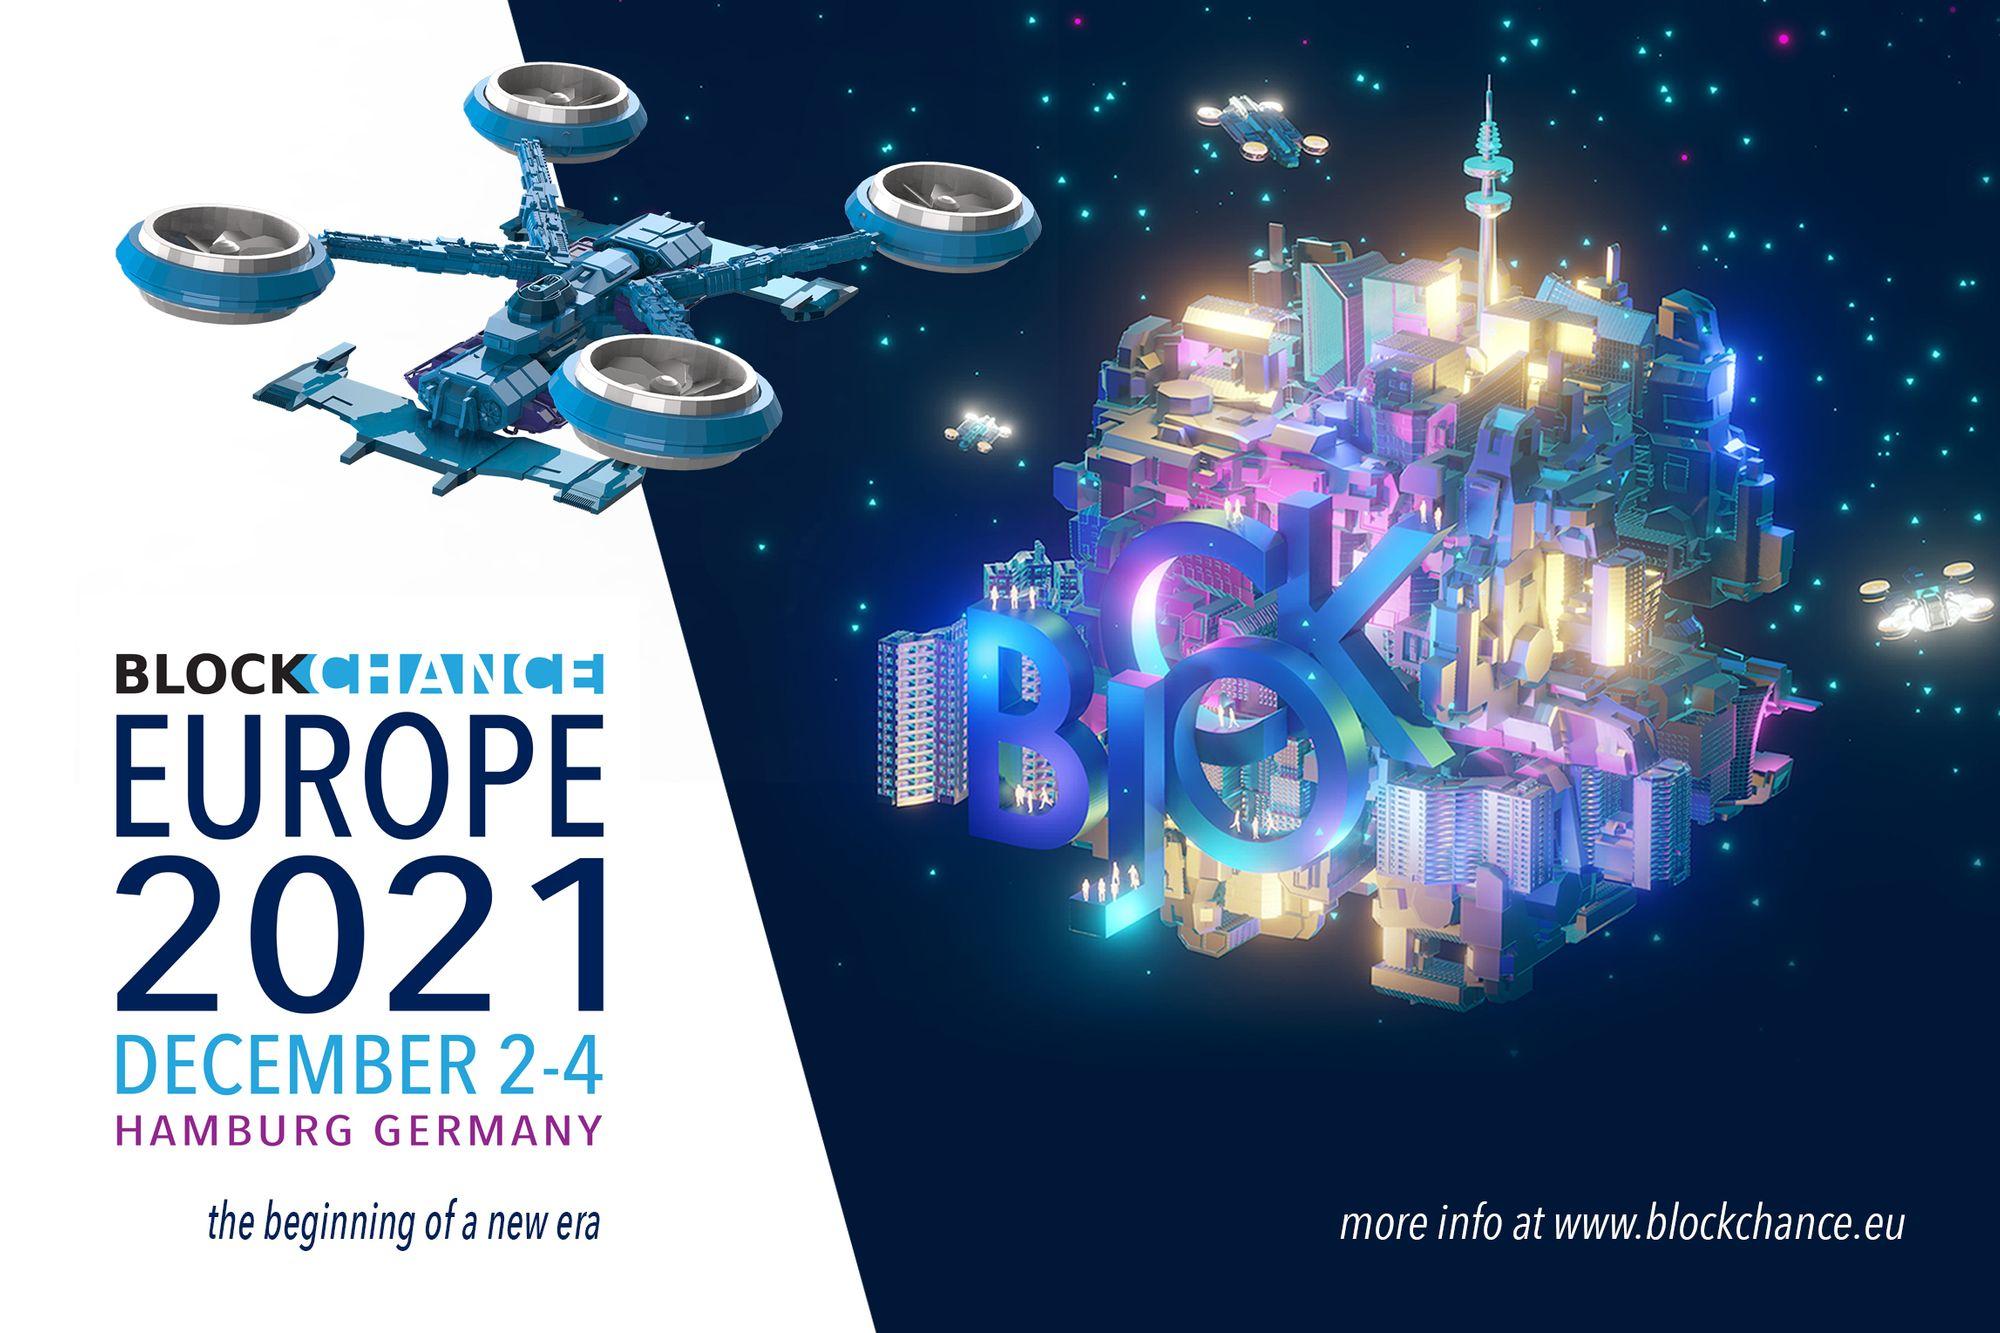 BLOCKCHANCE-Europe-2021